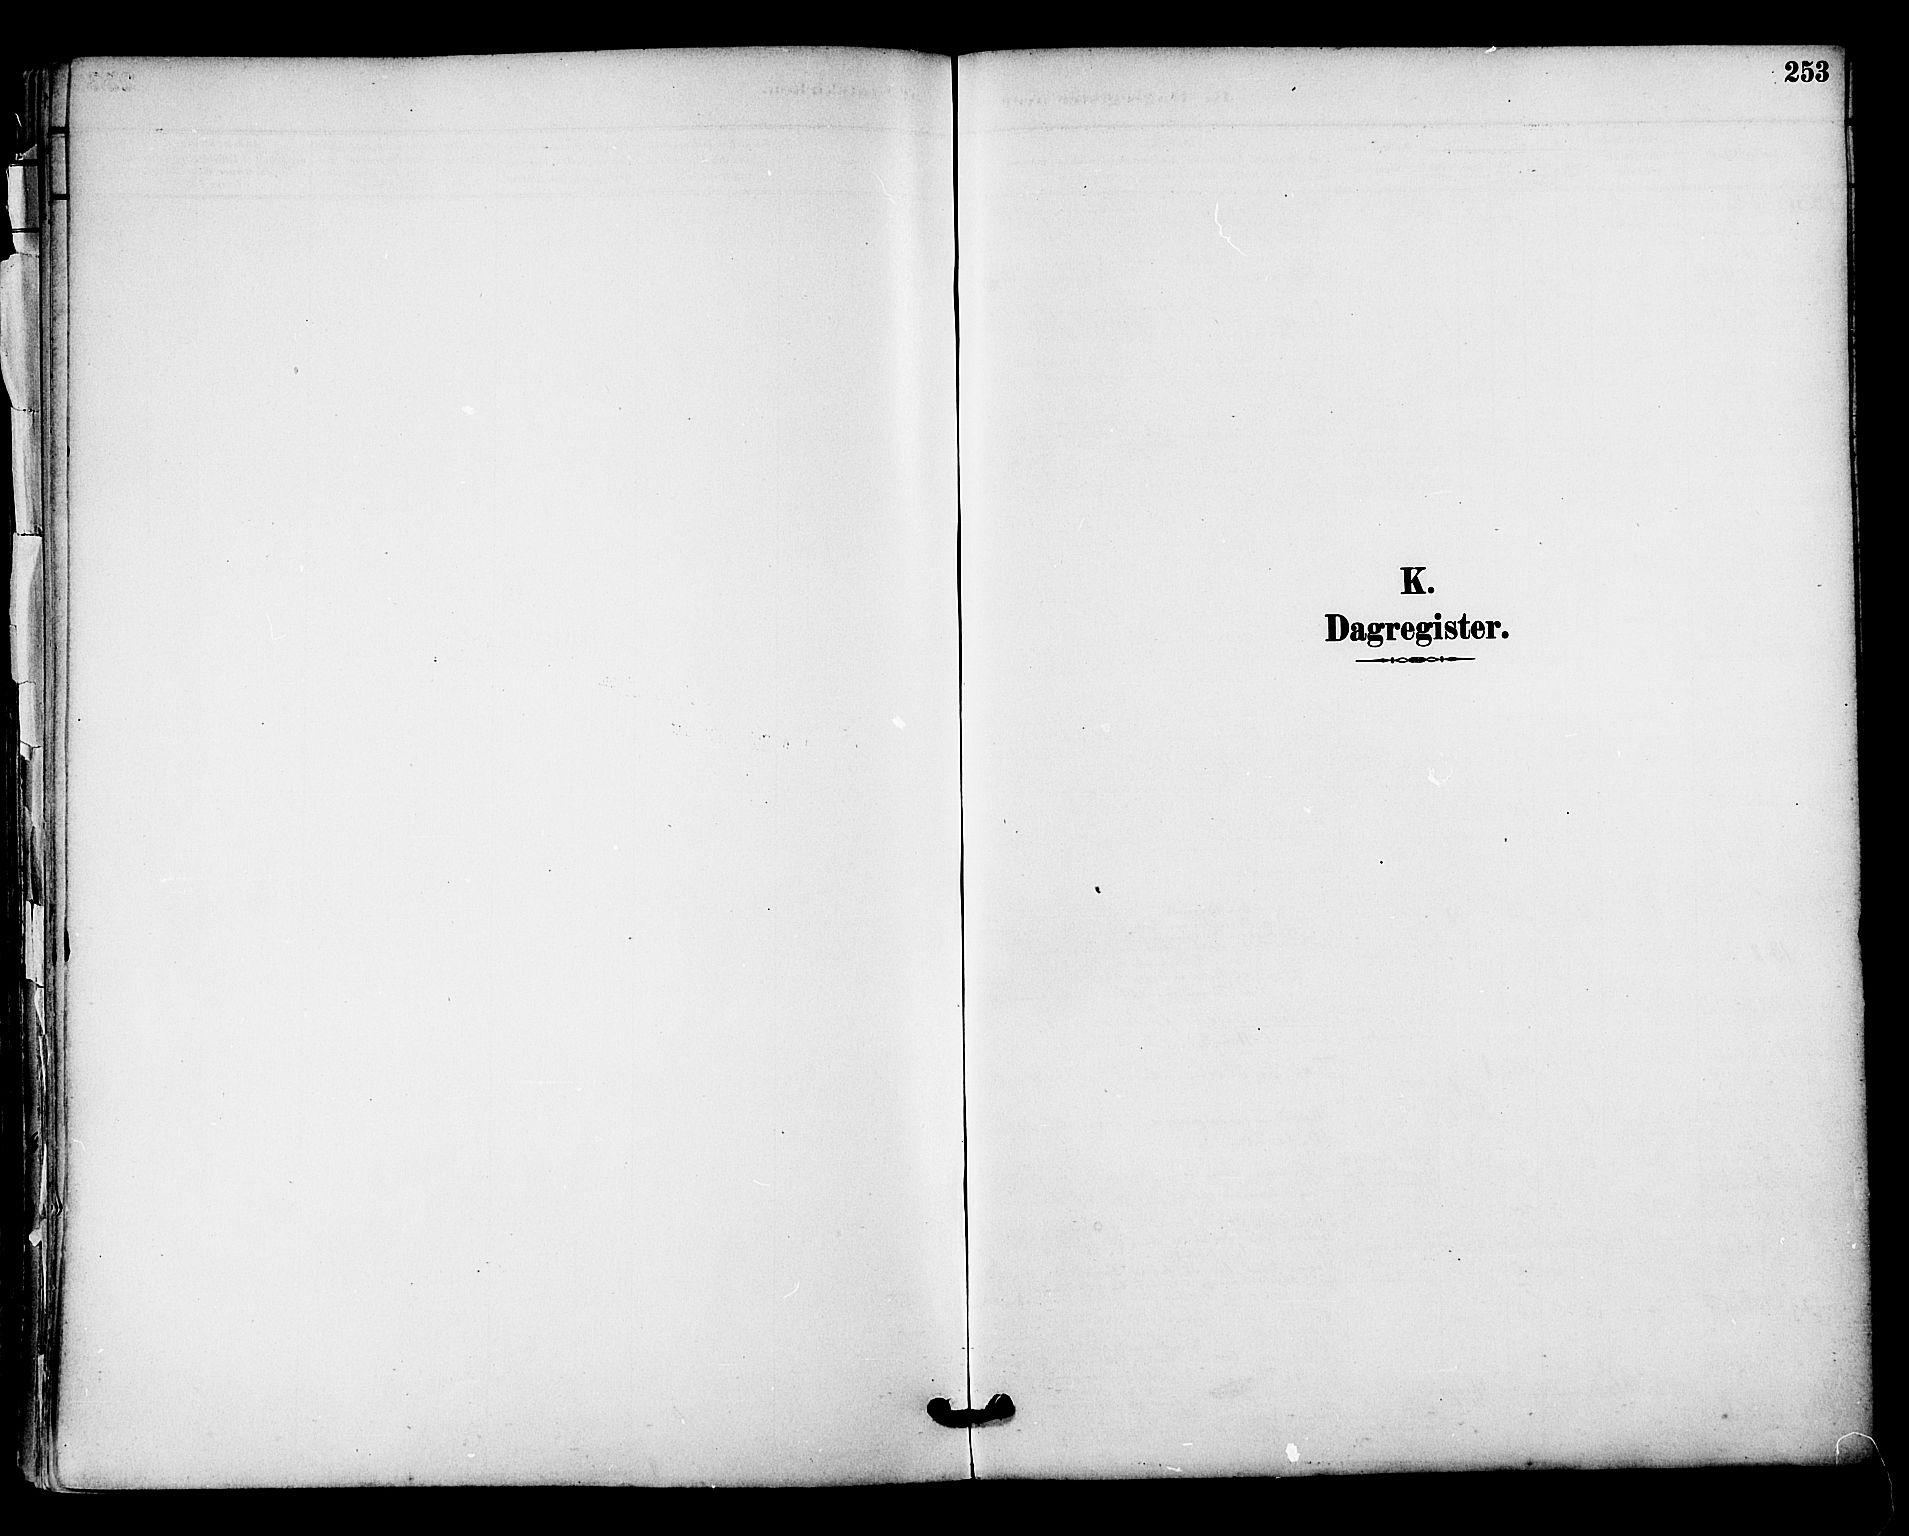 SAT, Ministerialprotokoller, klokkerbøker og fødselsregistre - Nordland, 813/L0200: Ministerialbok nr. 813A10, 1886-1900, s. 253